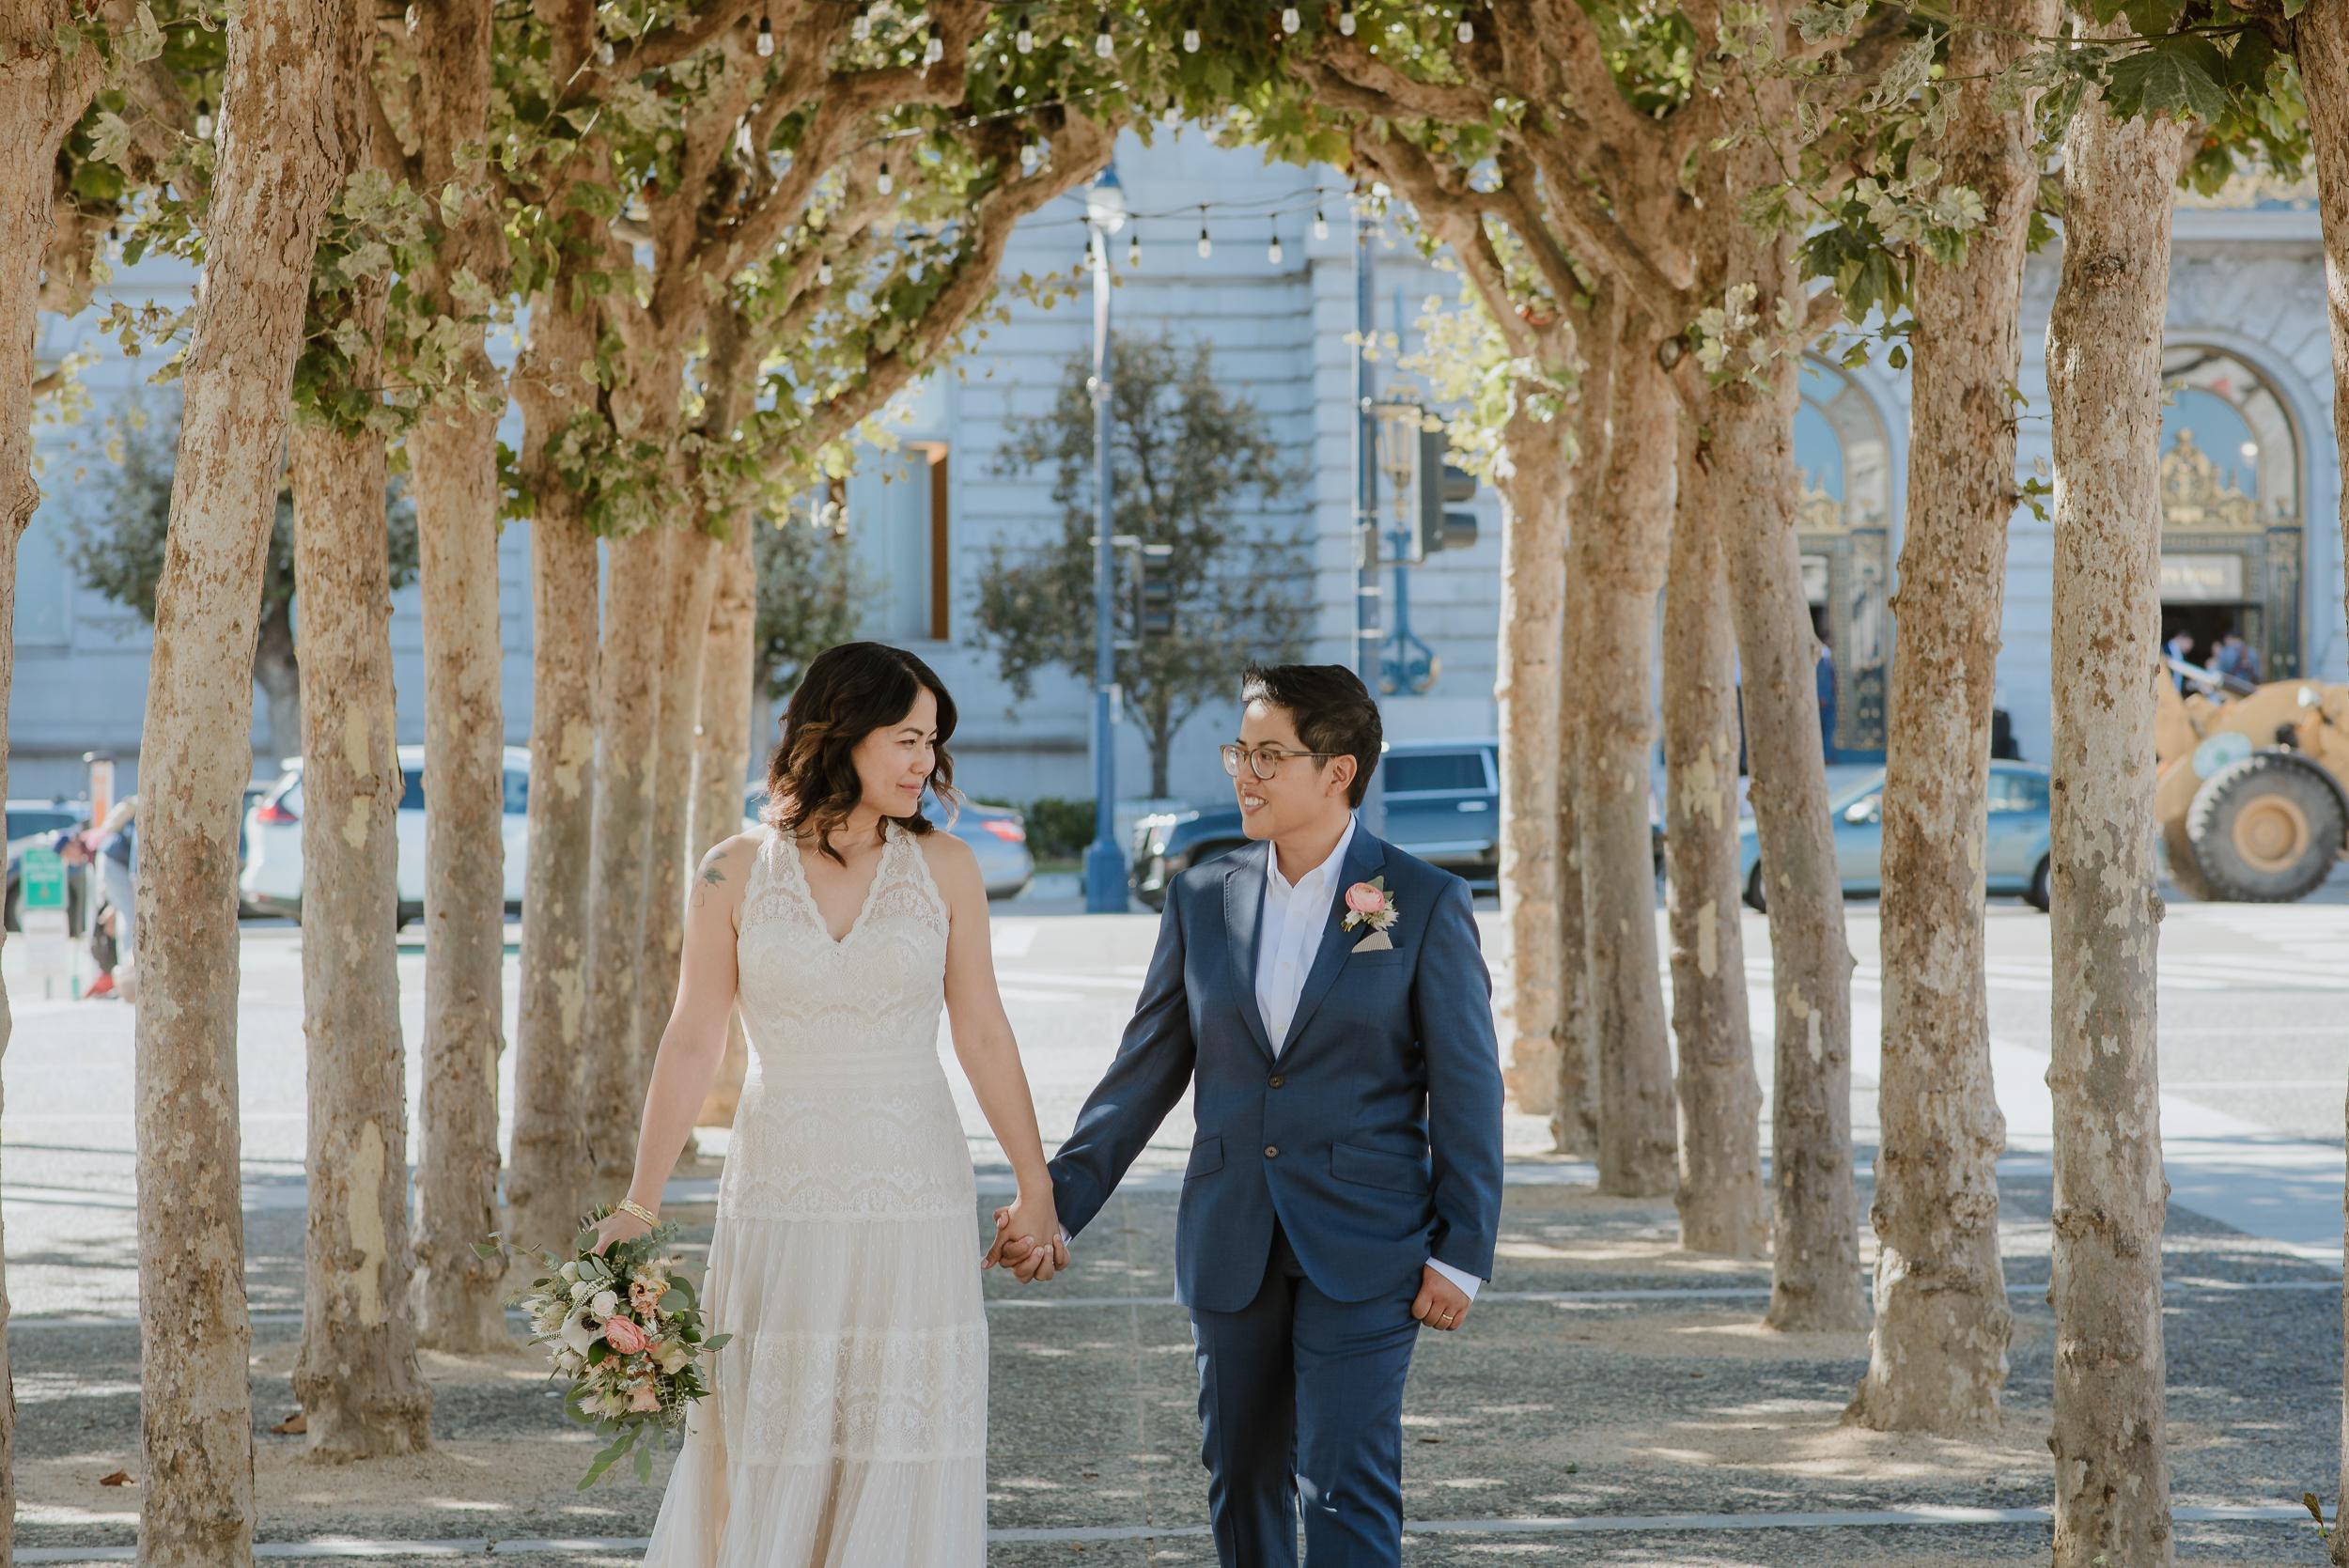 034-34-san-francisco-city-hall-stable-cafe-wedding-vivianchen-324.jpg